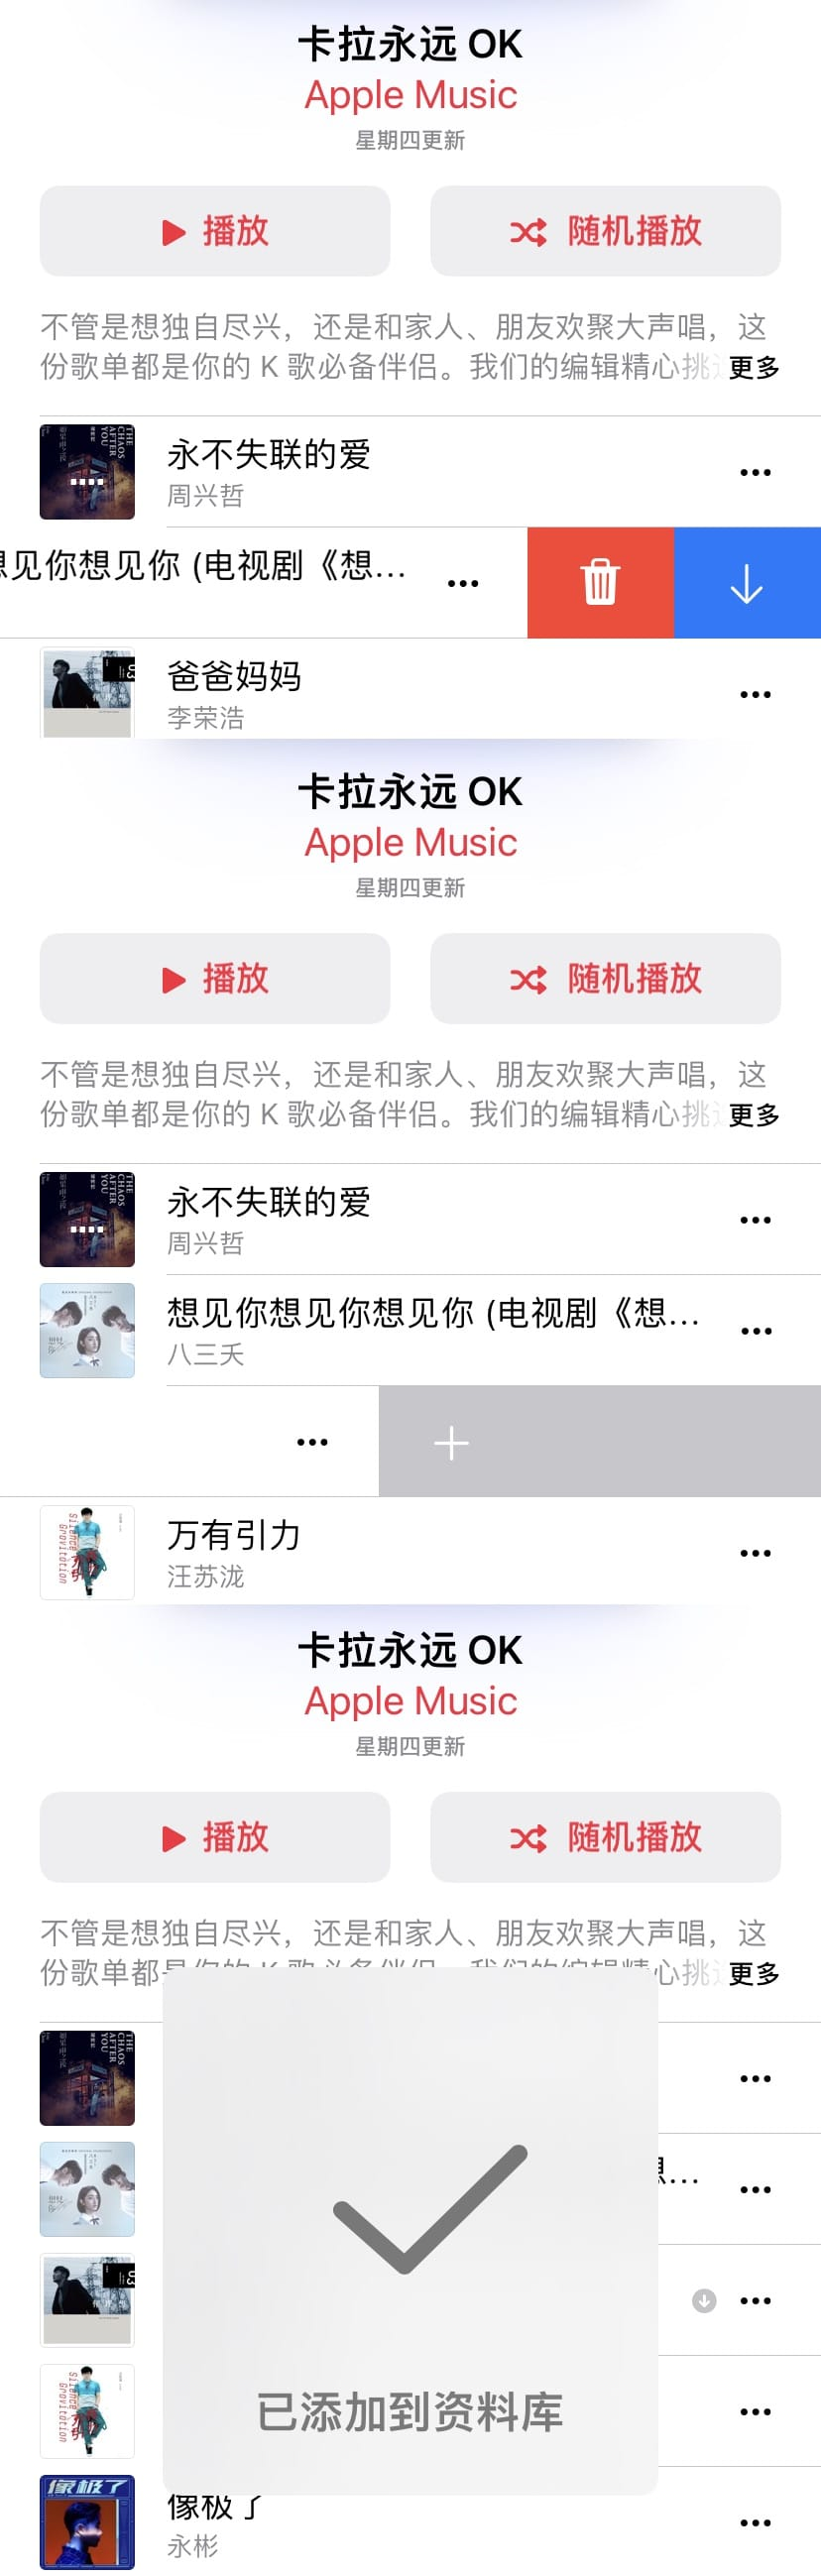 iOS 14.5 Beta 2 推送,我的手机又卡了?